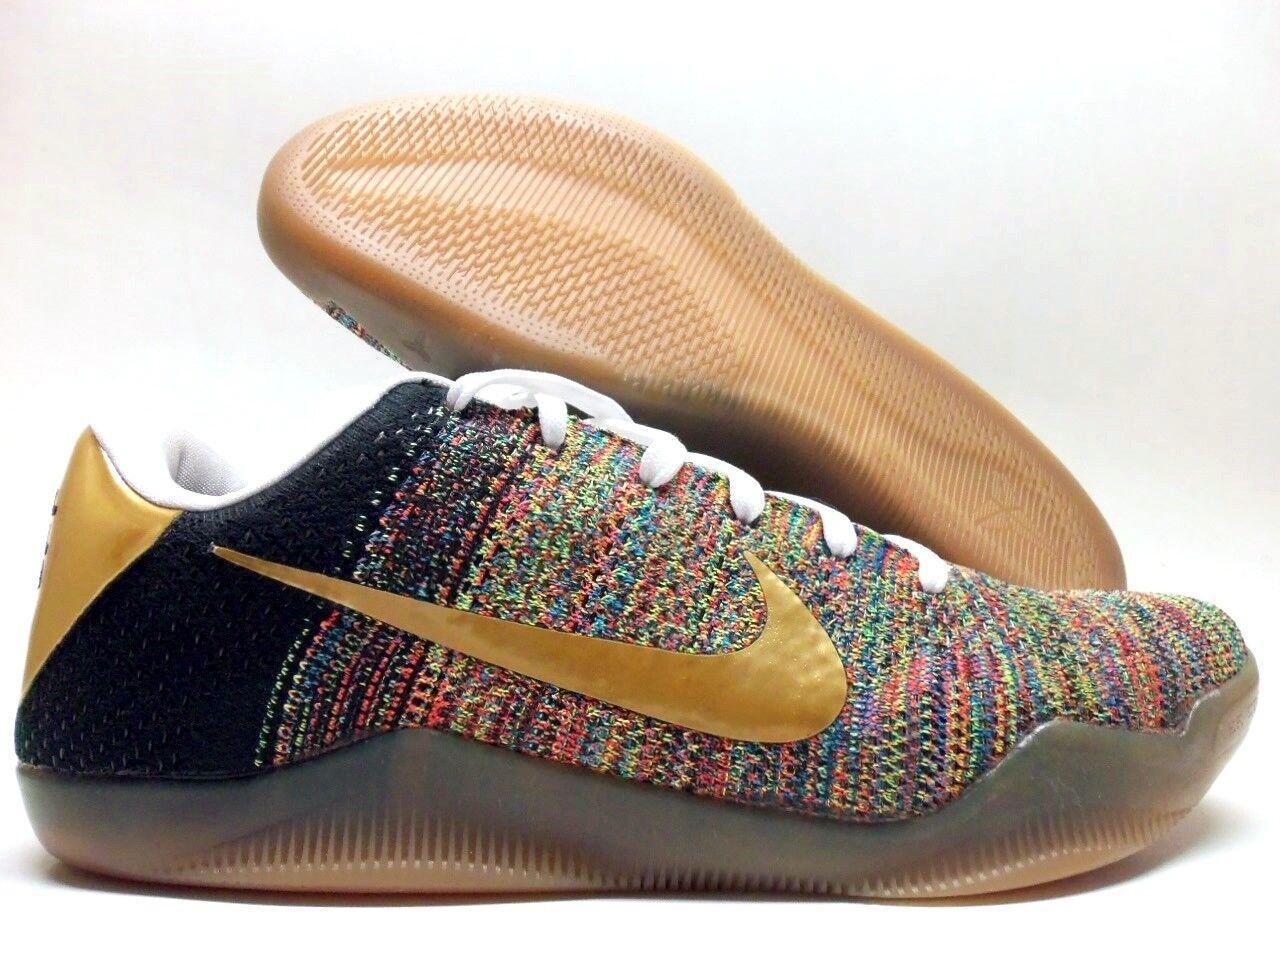 Nike kobe xi 11 flyknit elite basso id multi-color-gold dimensioni uomini [903712-993]